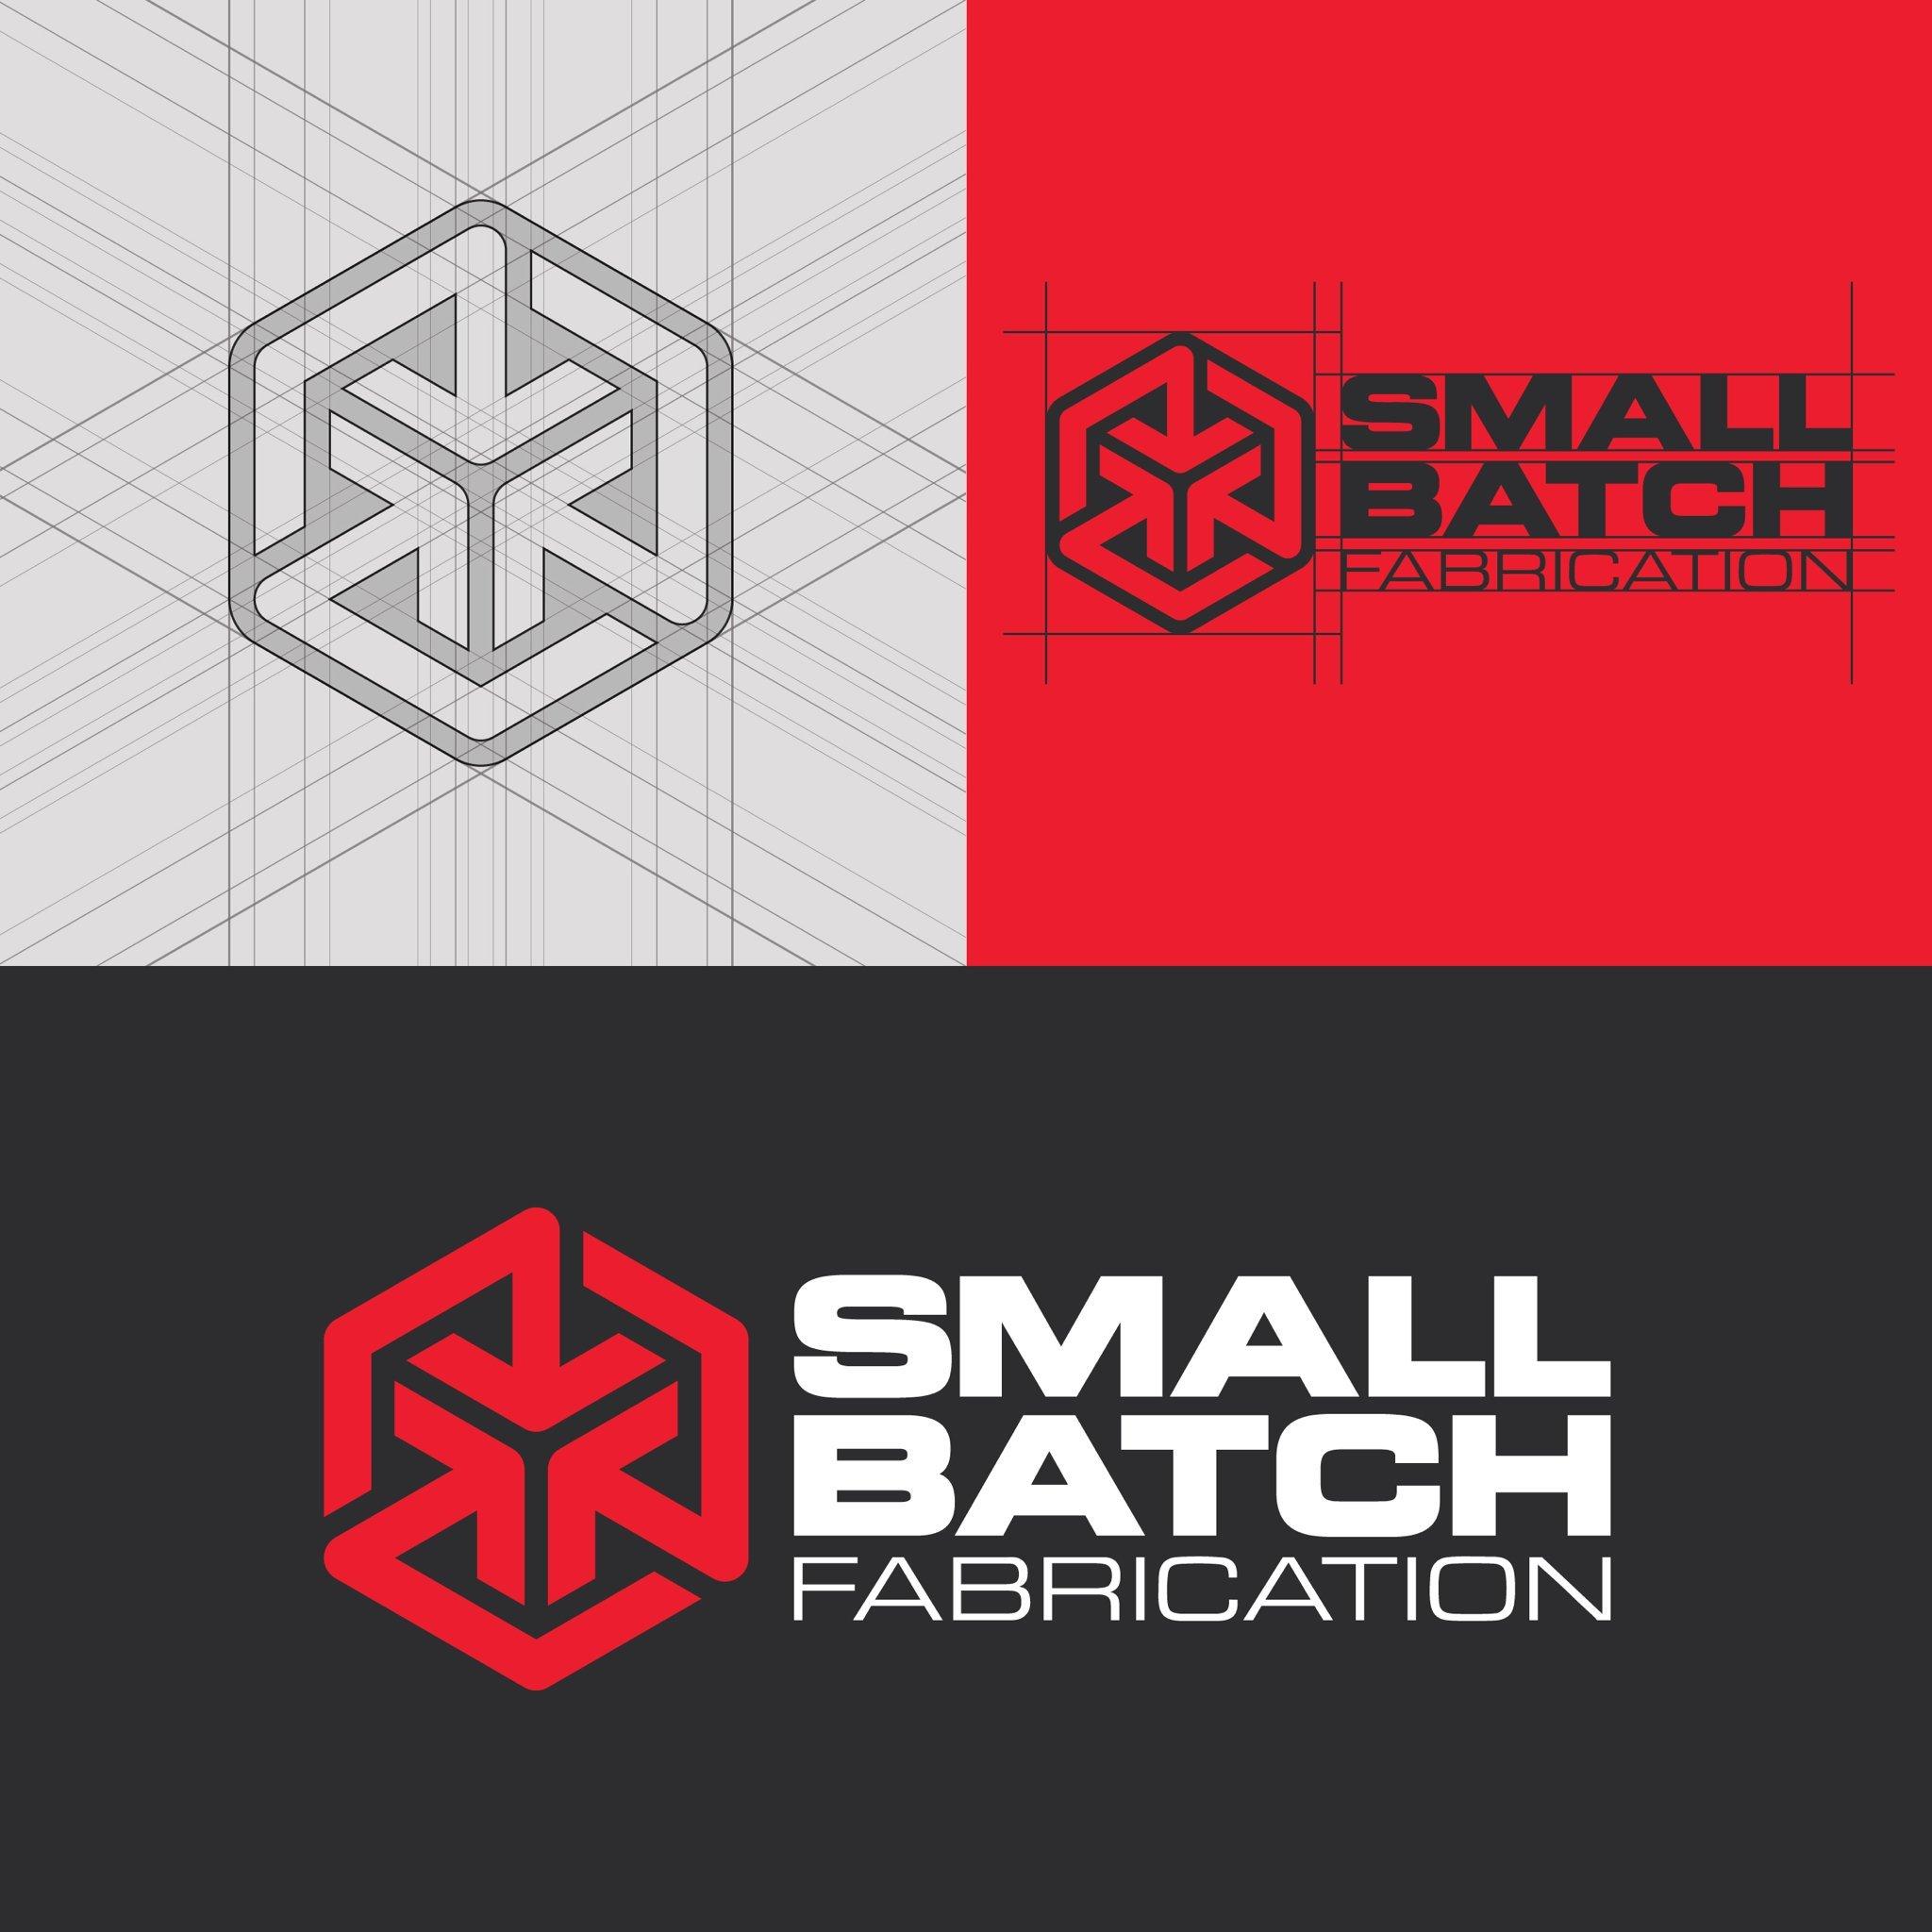 Small Batch Fabrication Brand Logo Design By Design Cypher